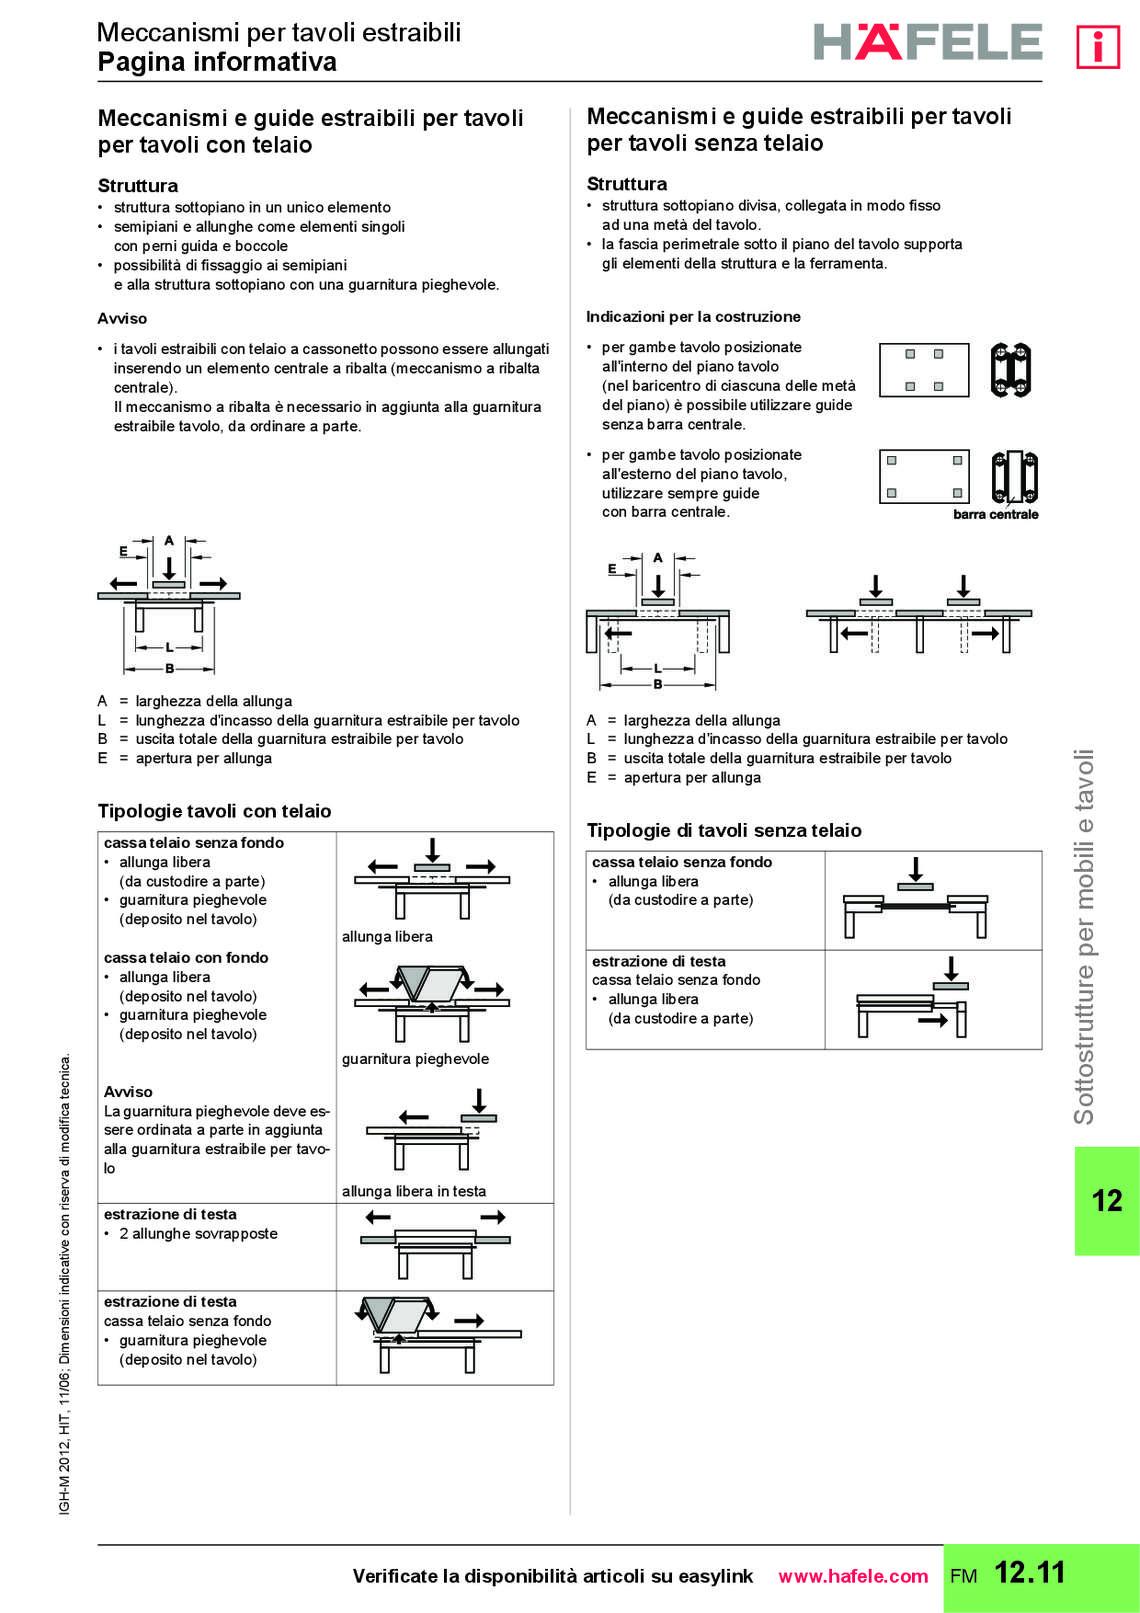 hafele-sottostrutture-per-mobili_83_022.jpg